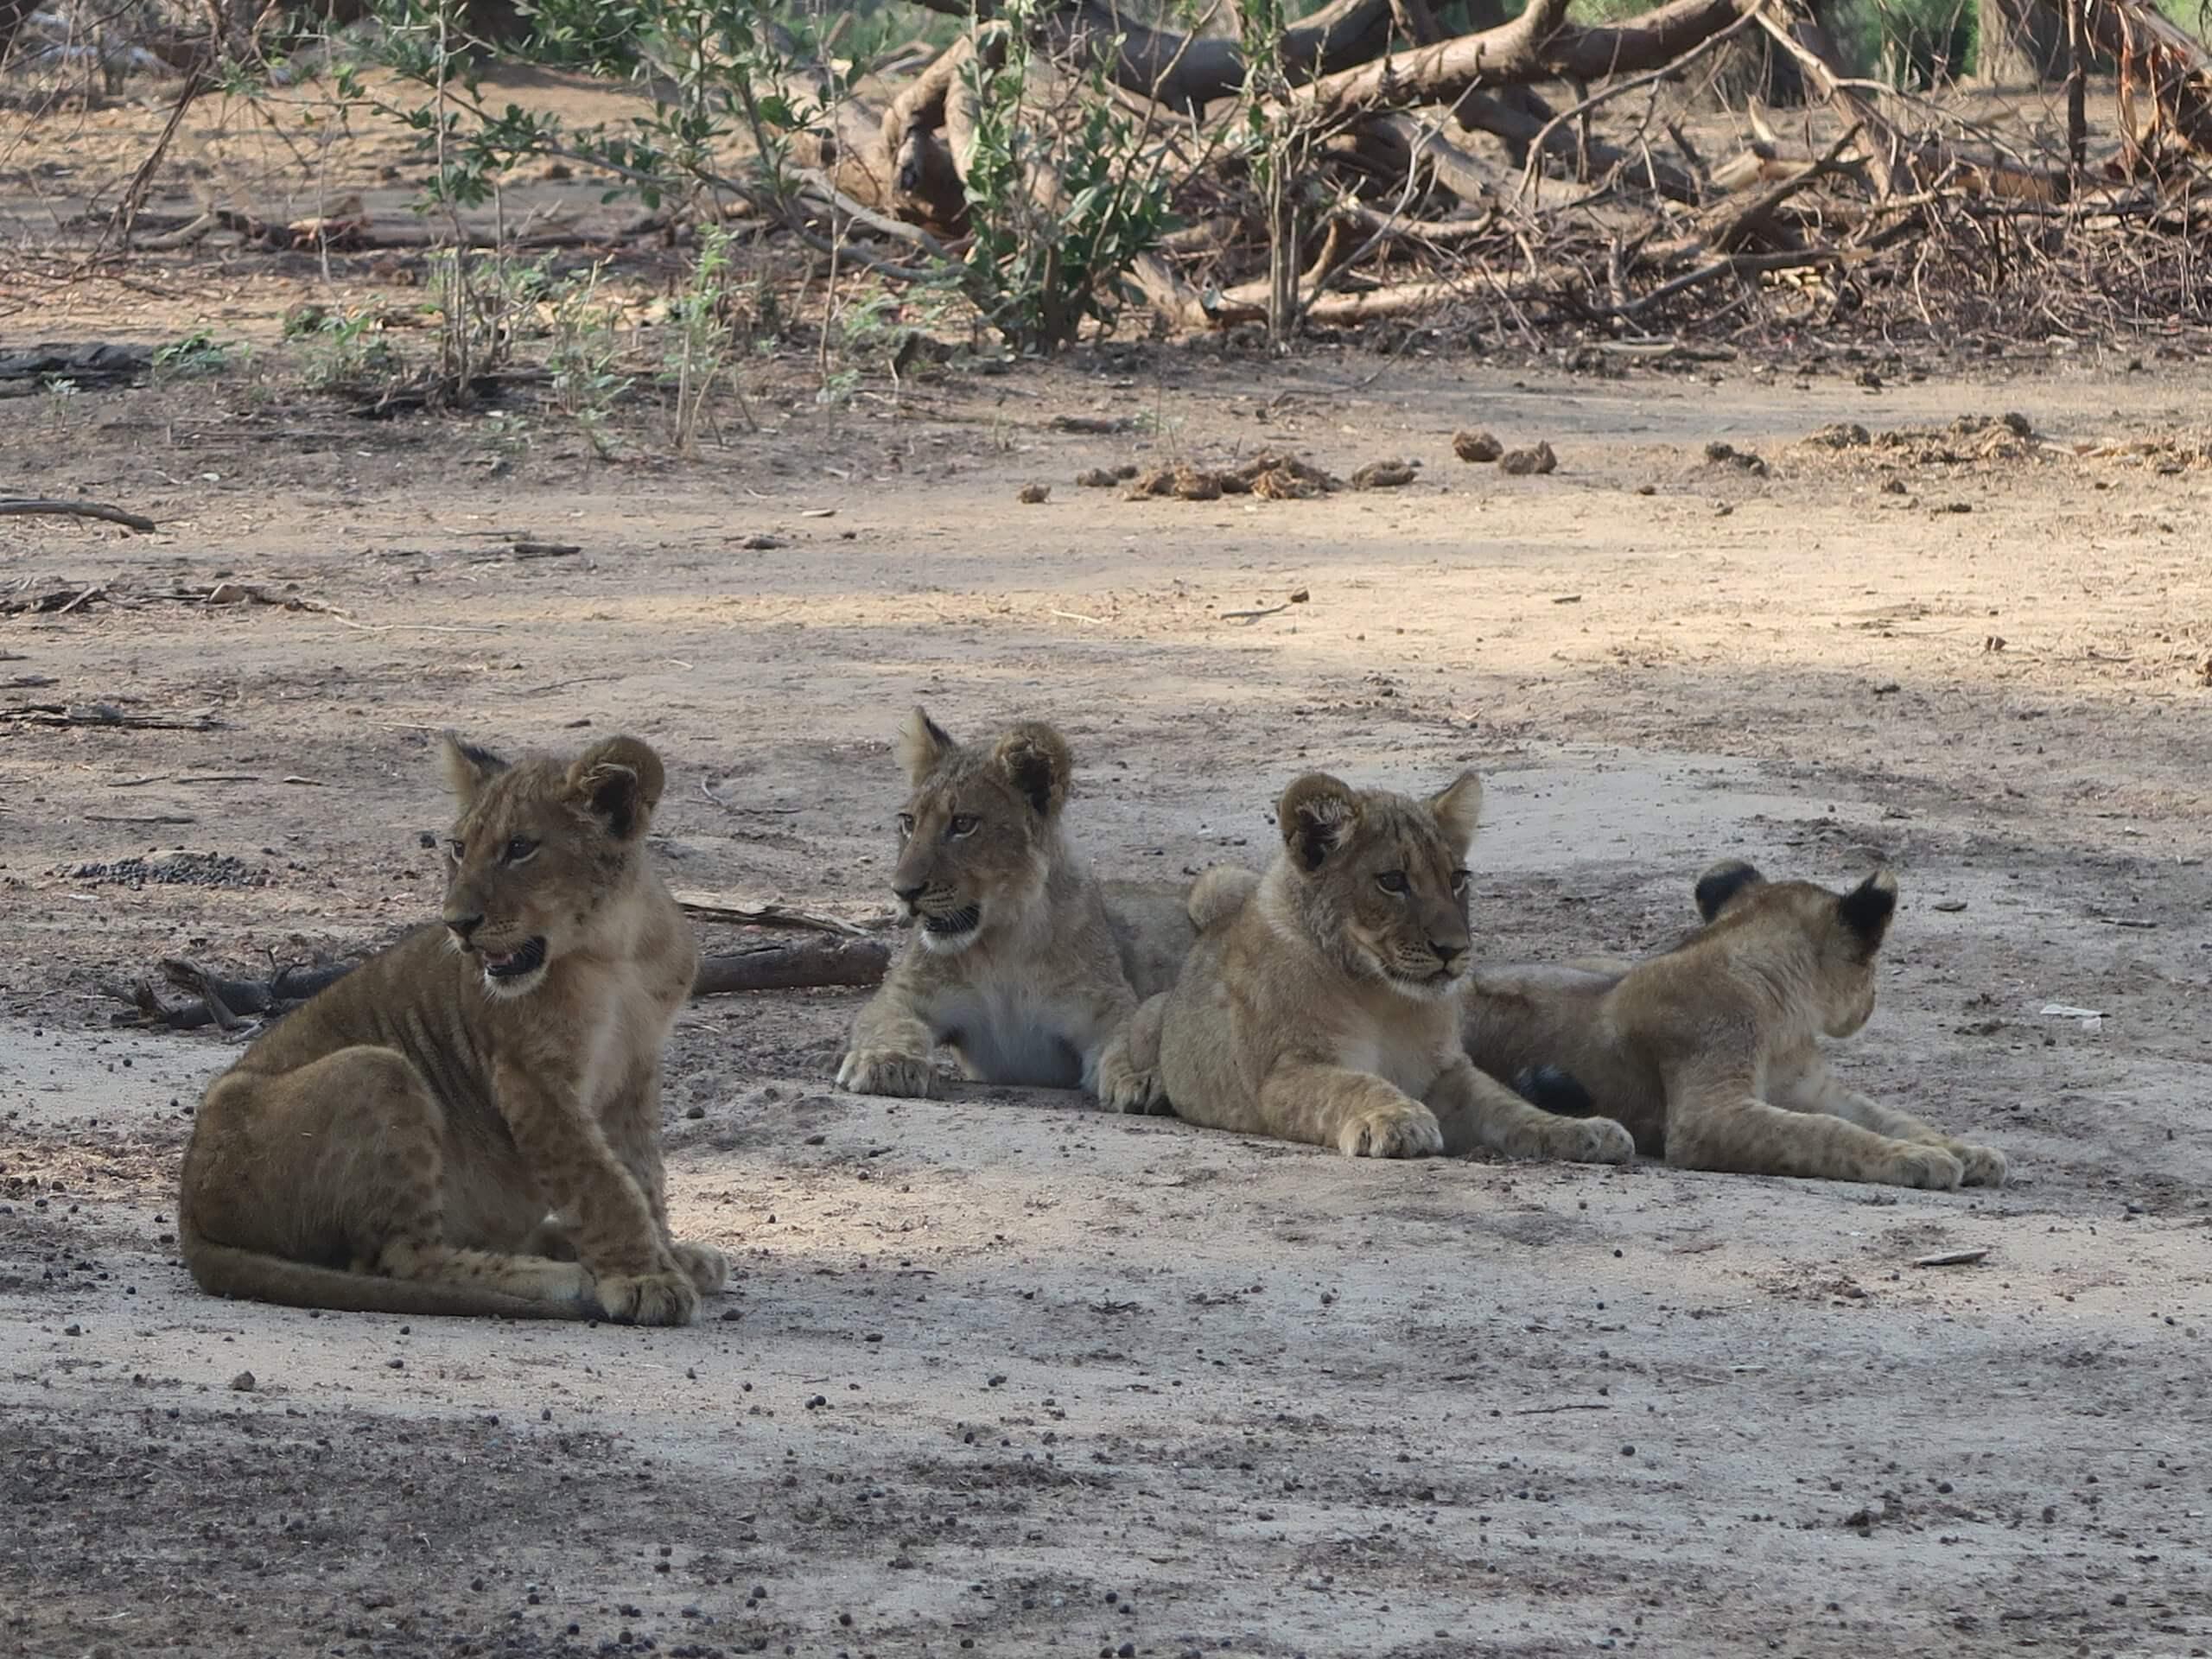 Lower Zambezi National Park leeuwen welpjes